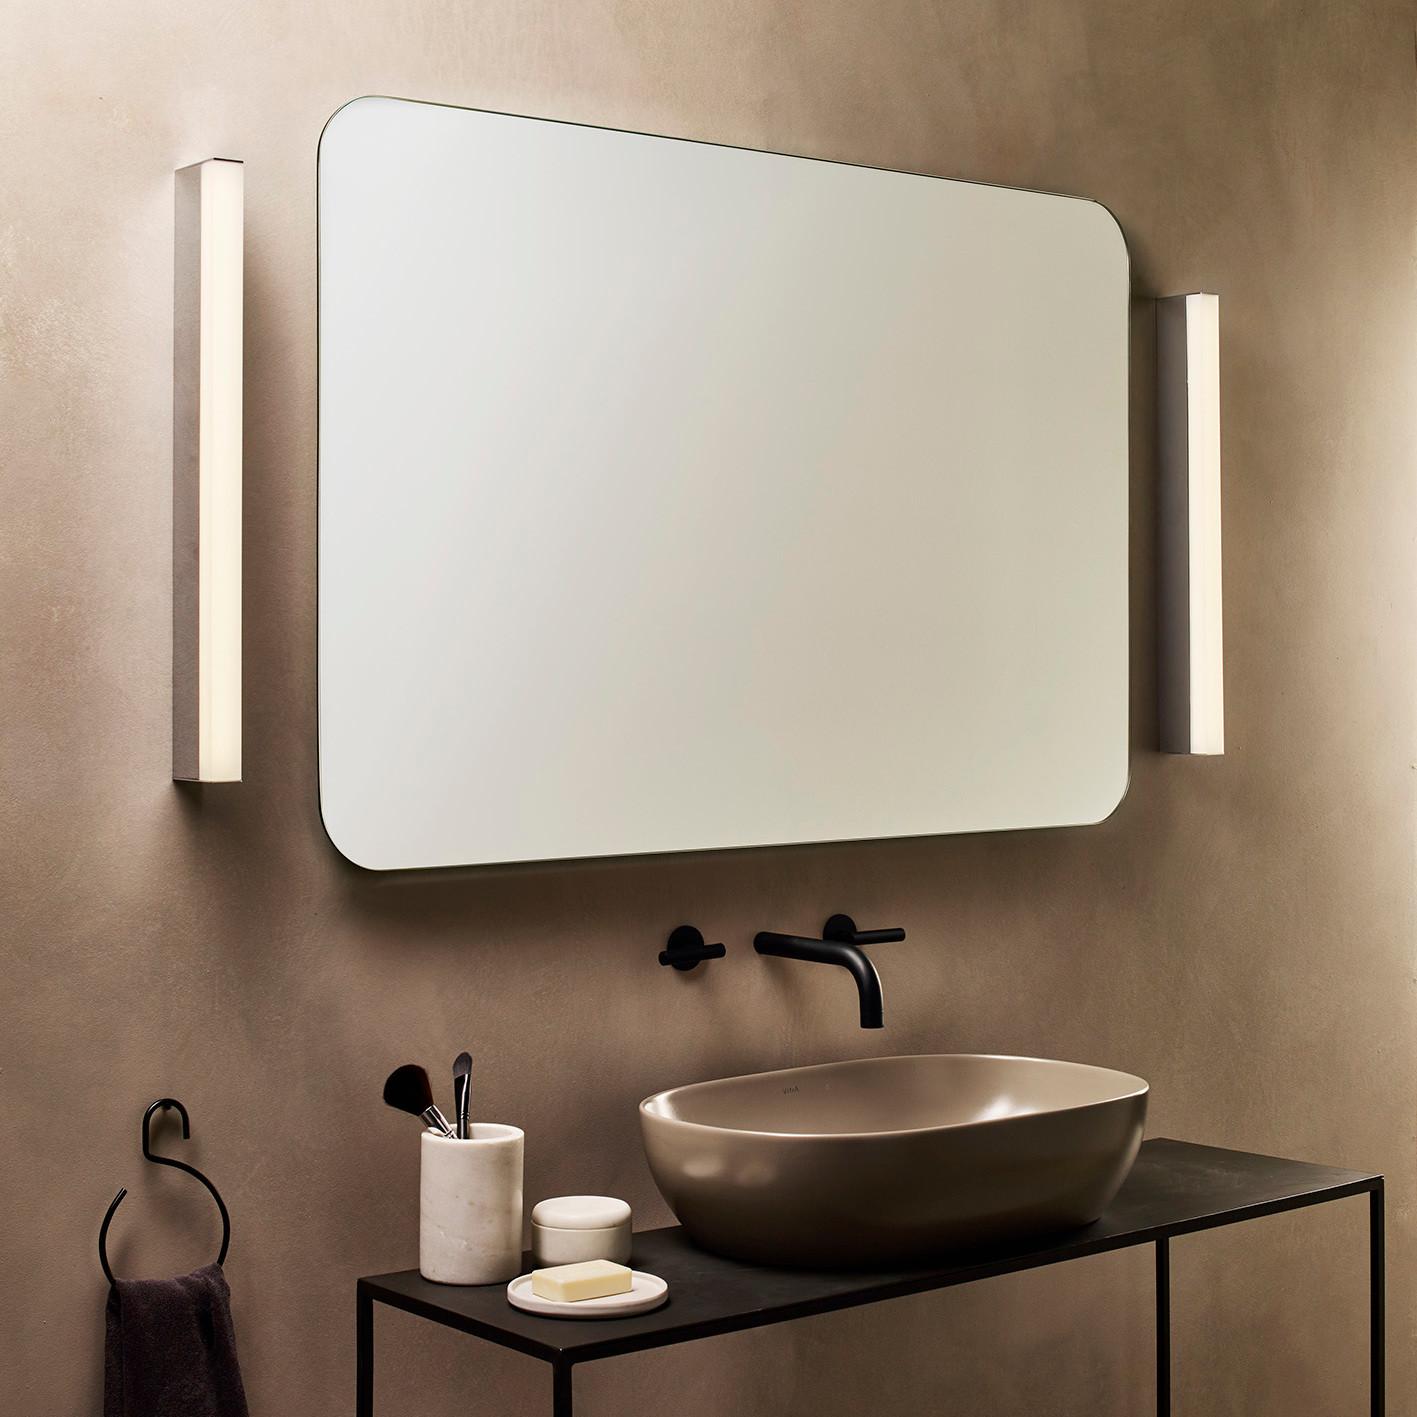 LED lamps bathroom product?